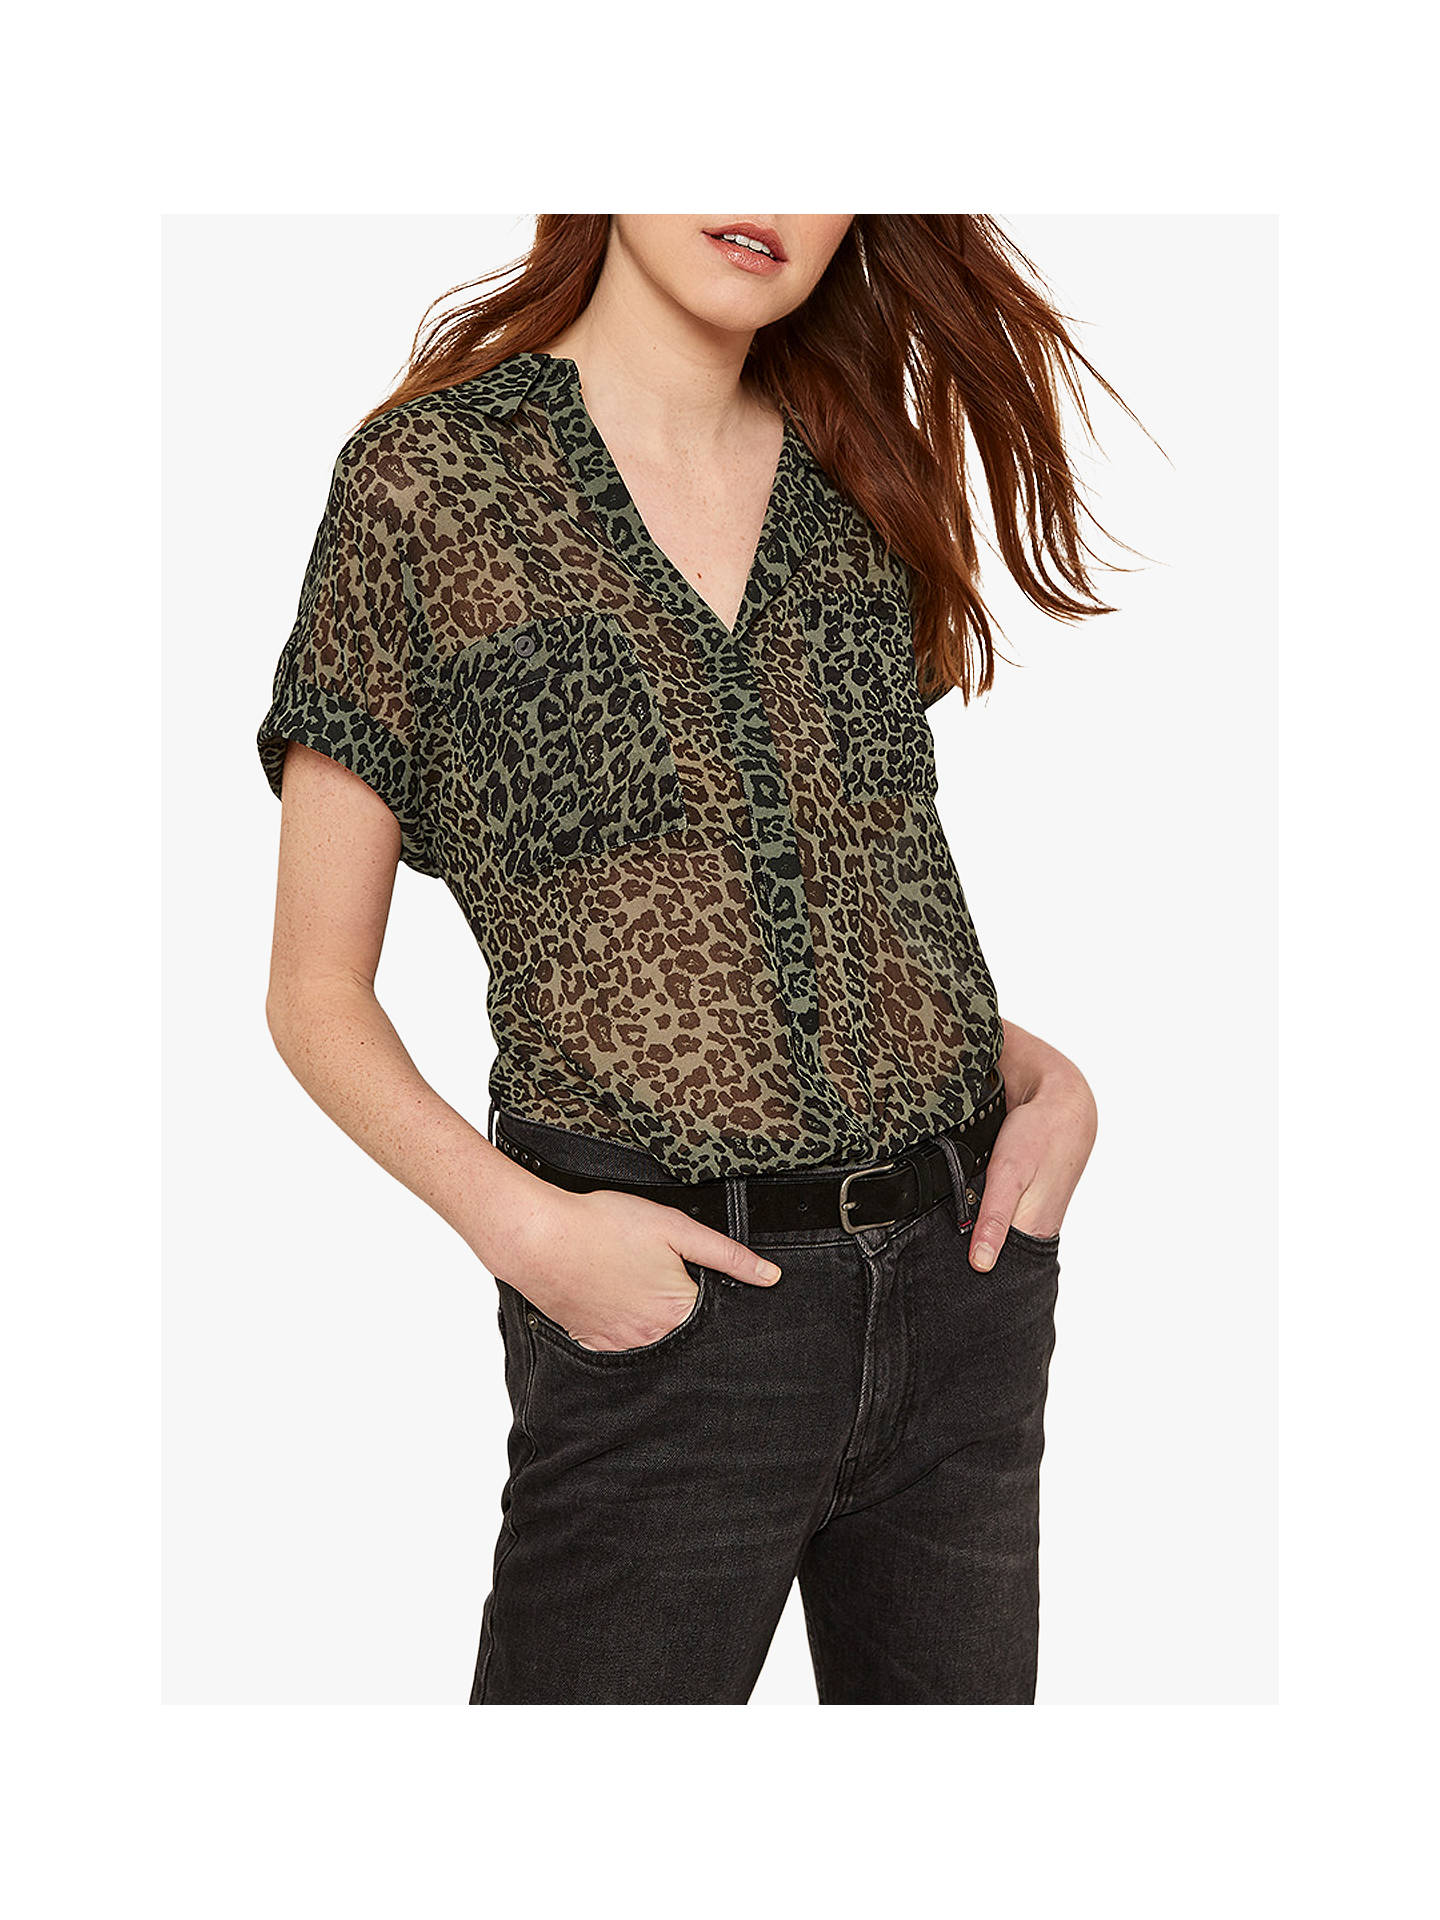 592479b8b92db Buy Mint Velvet Philippa Animal Print Shirt, Multi, 6 Online at  johnlewis.com ...